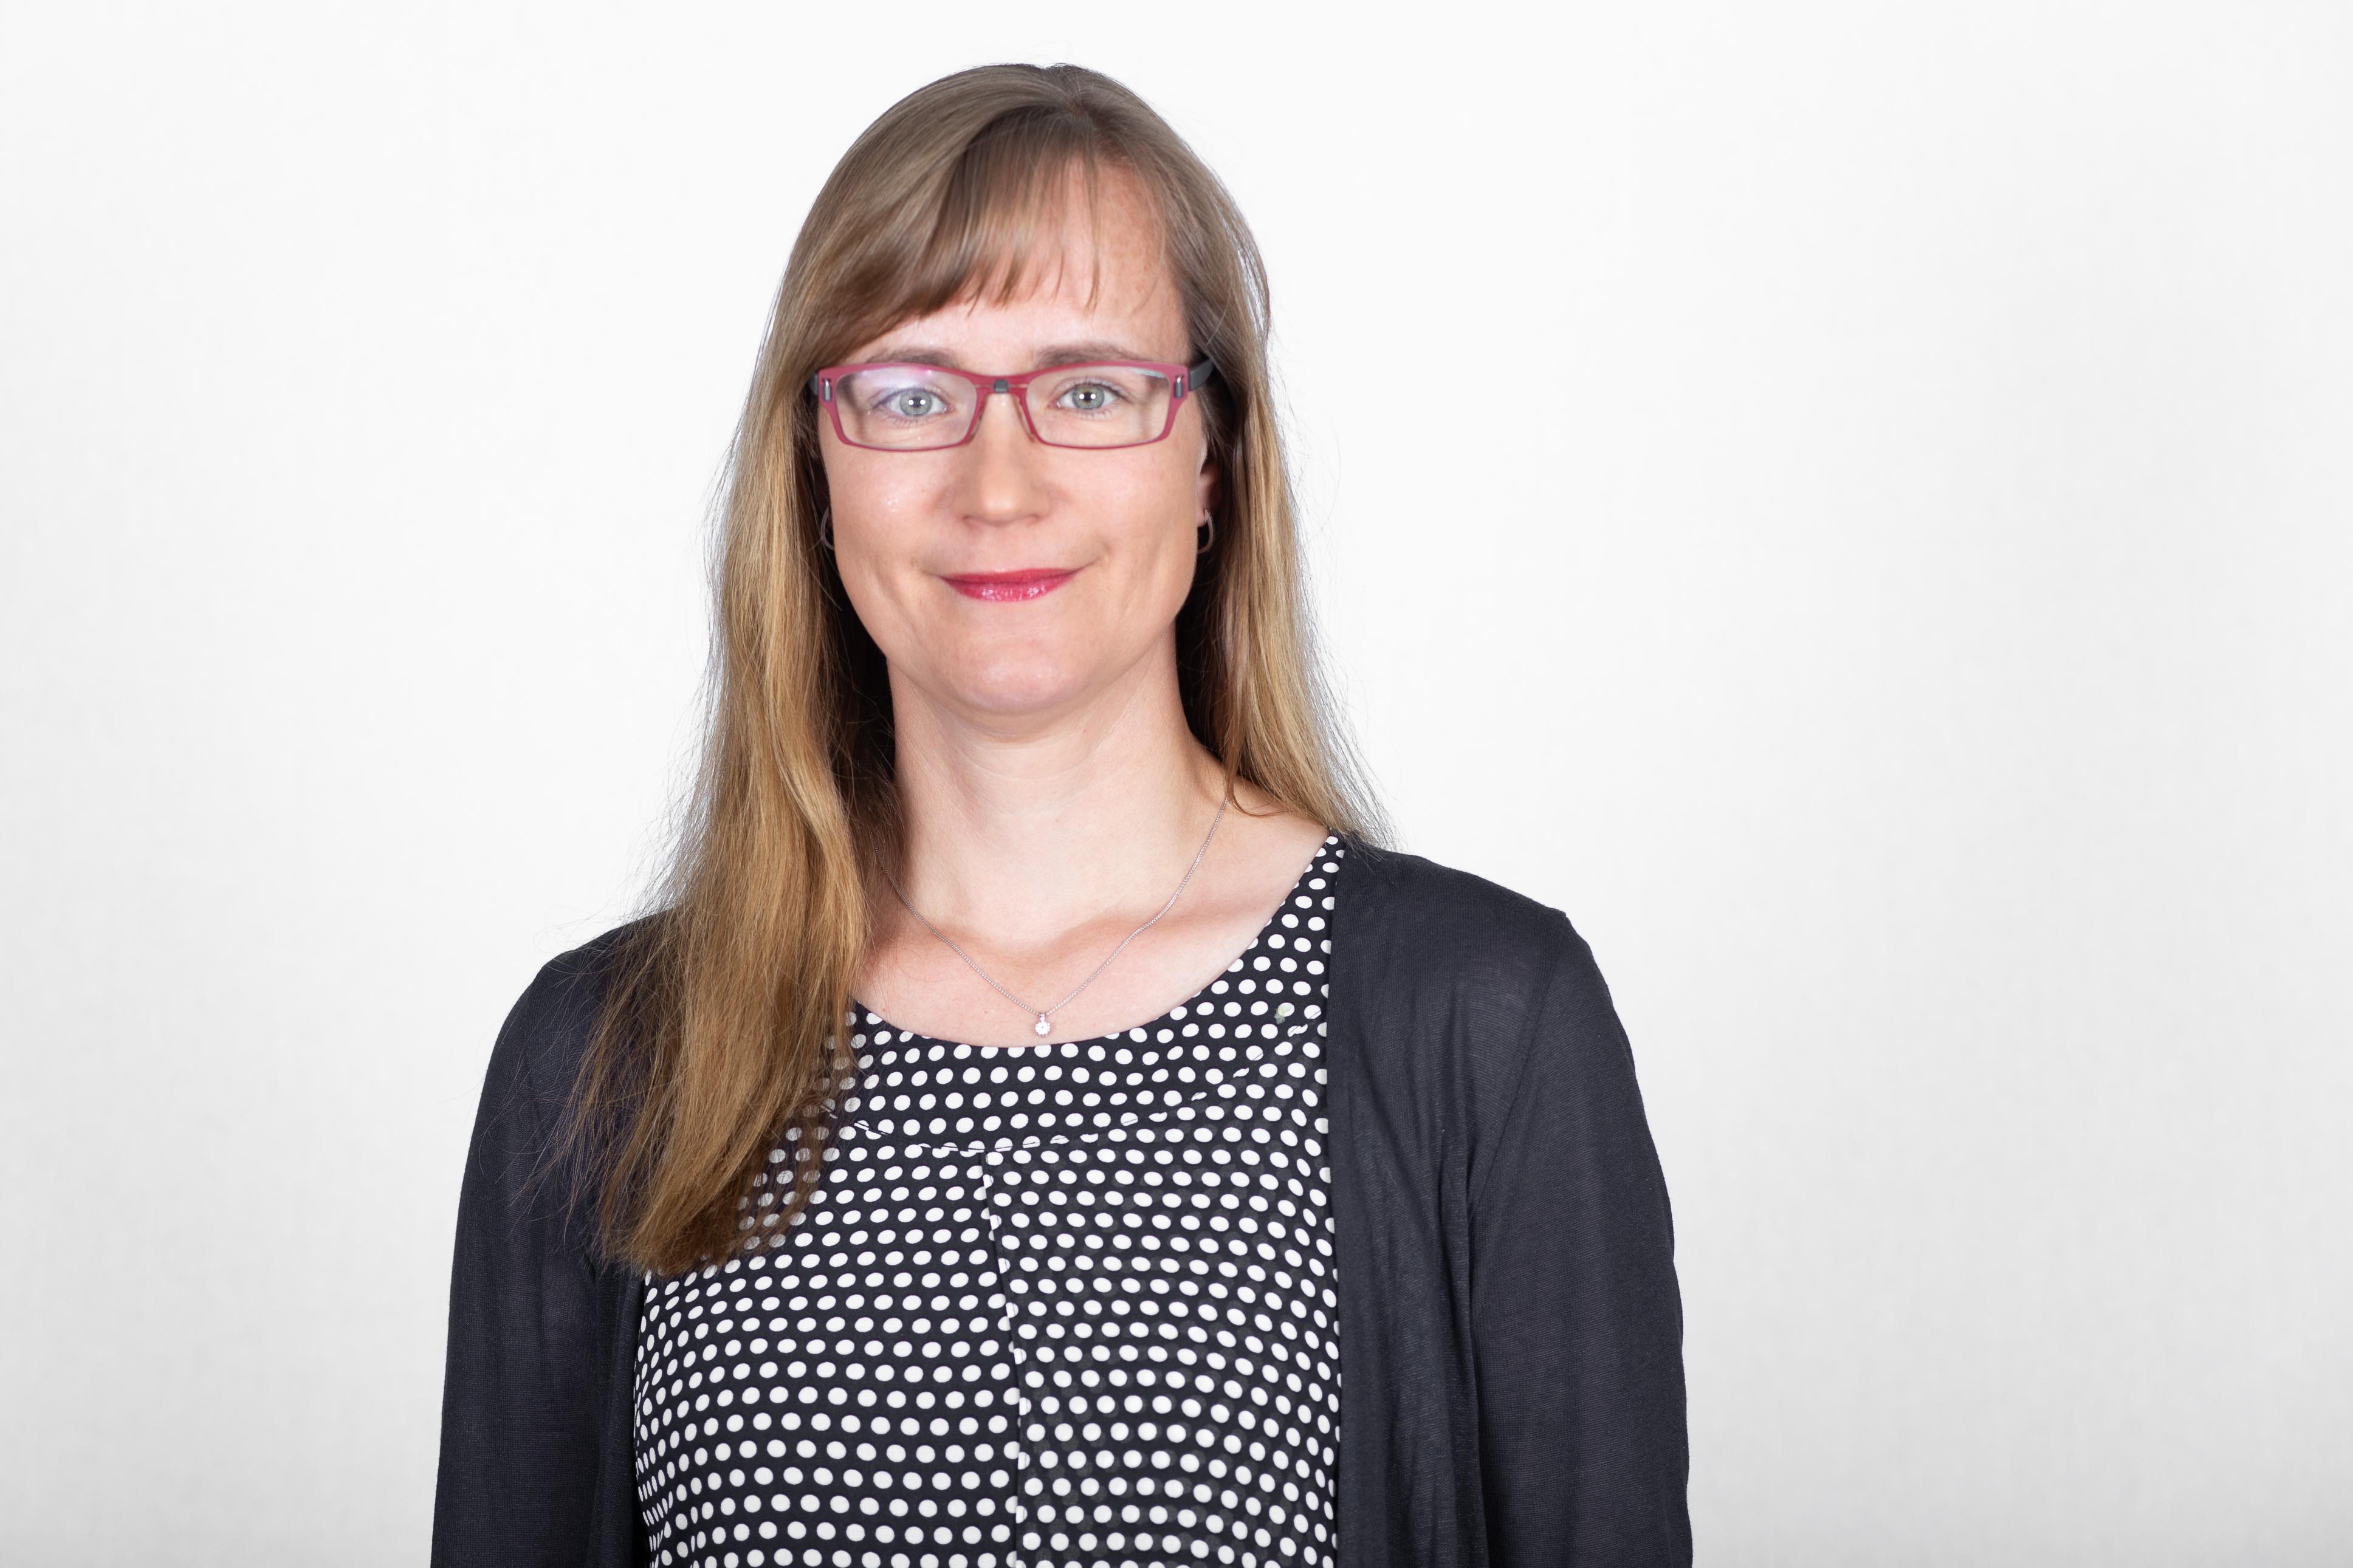 single partys sachsen anhalt Oder-Spree Ulrike - Profil 1003